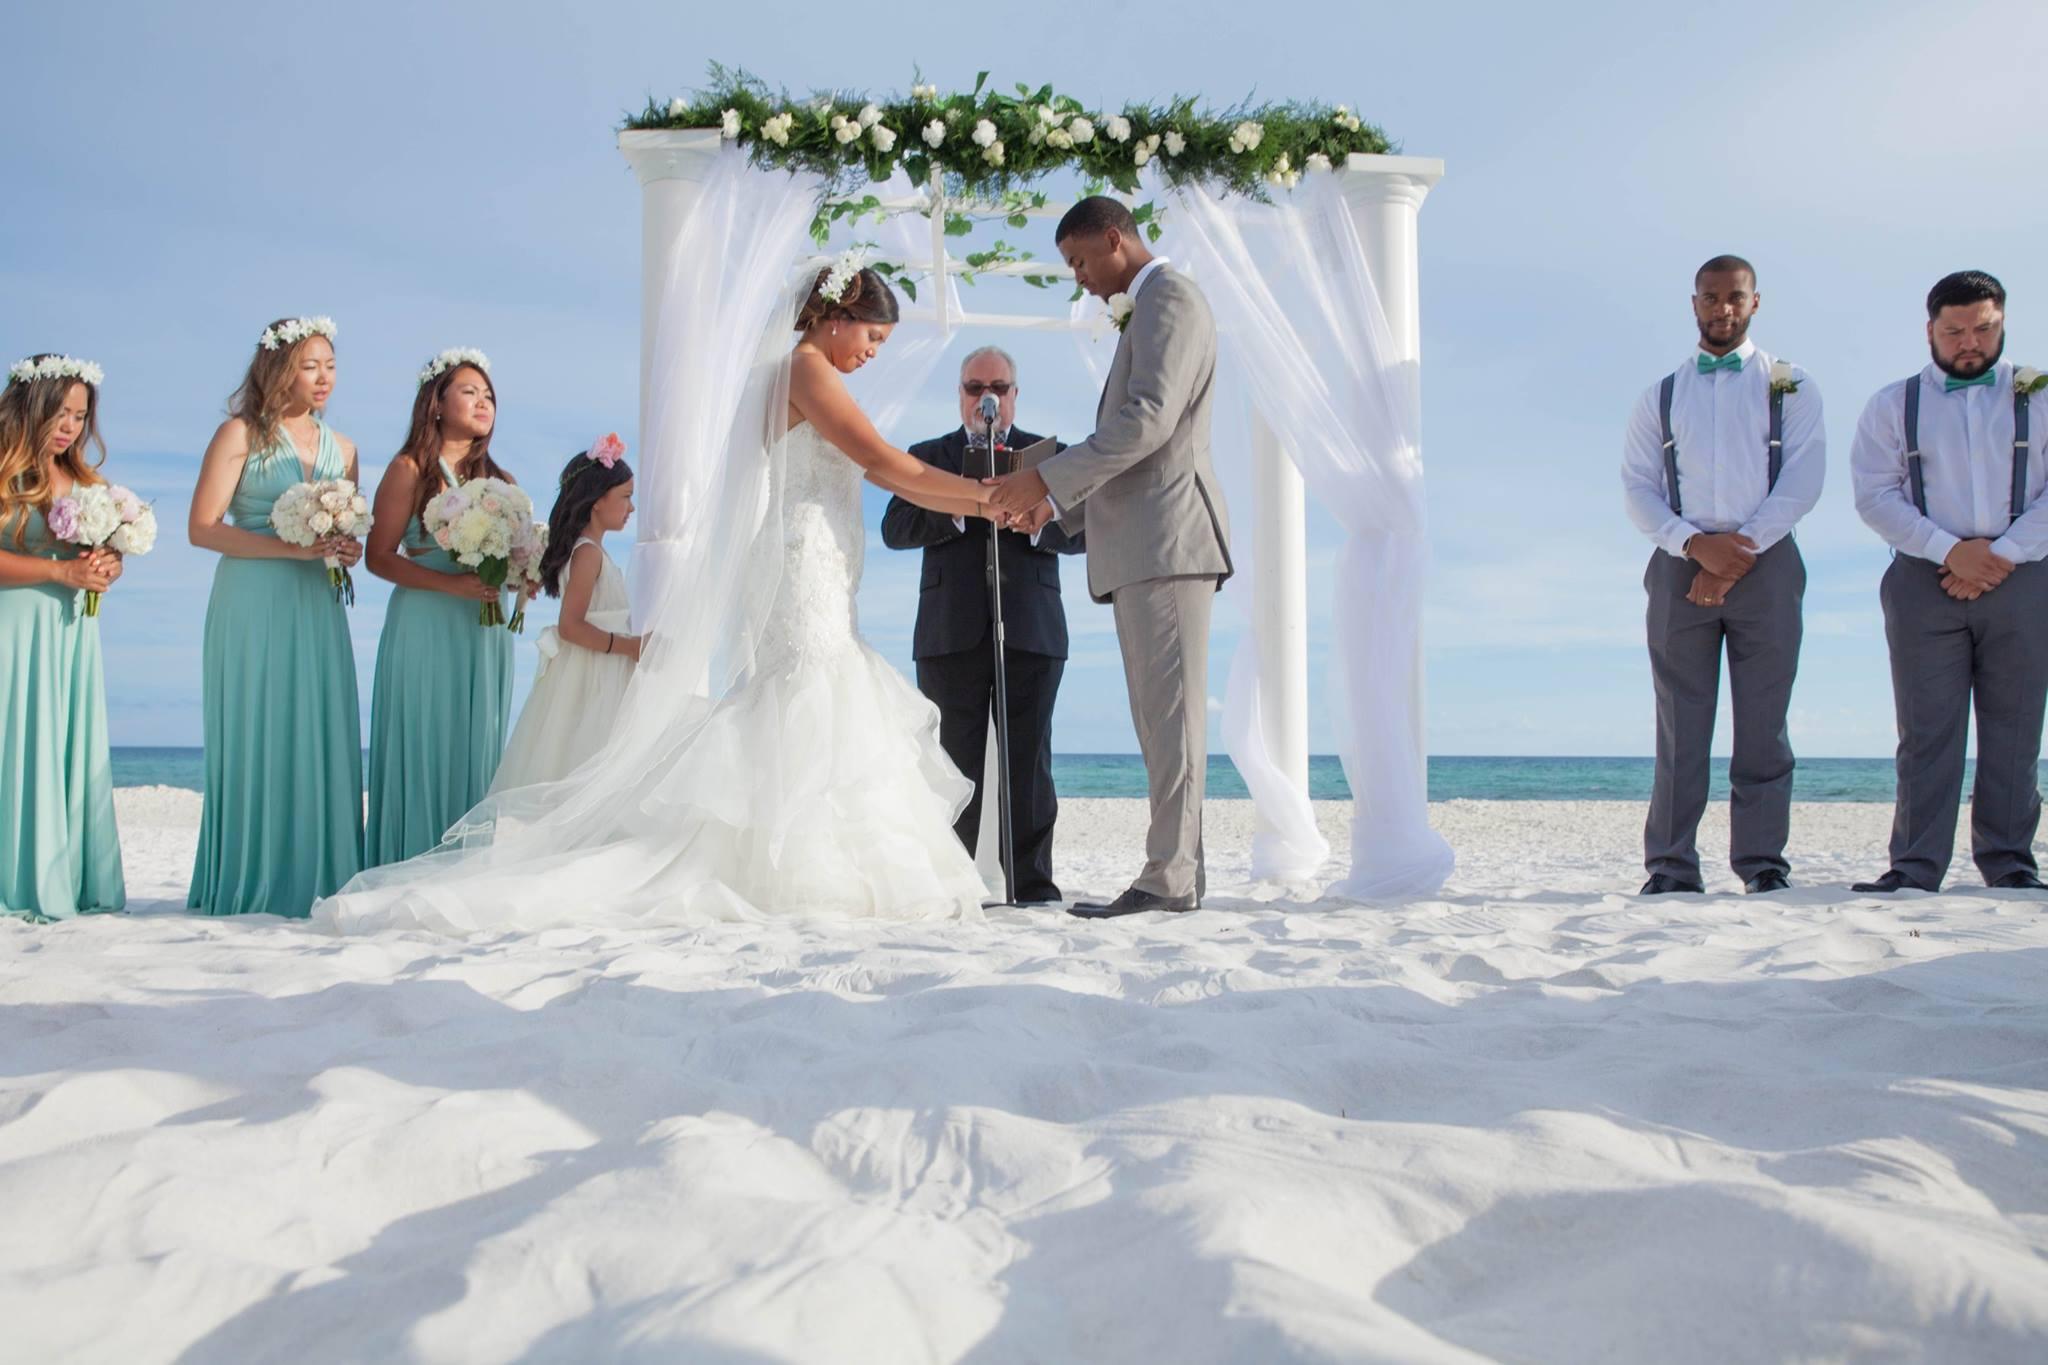 Customized Destin Florida beach wedding package